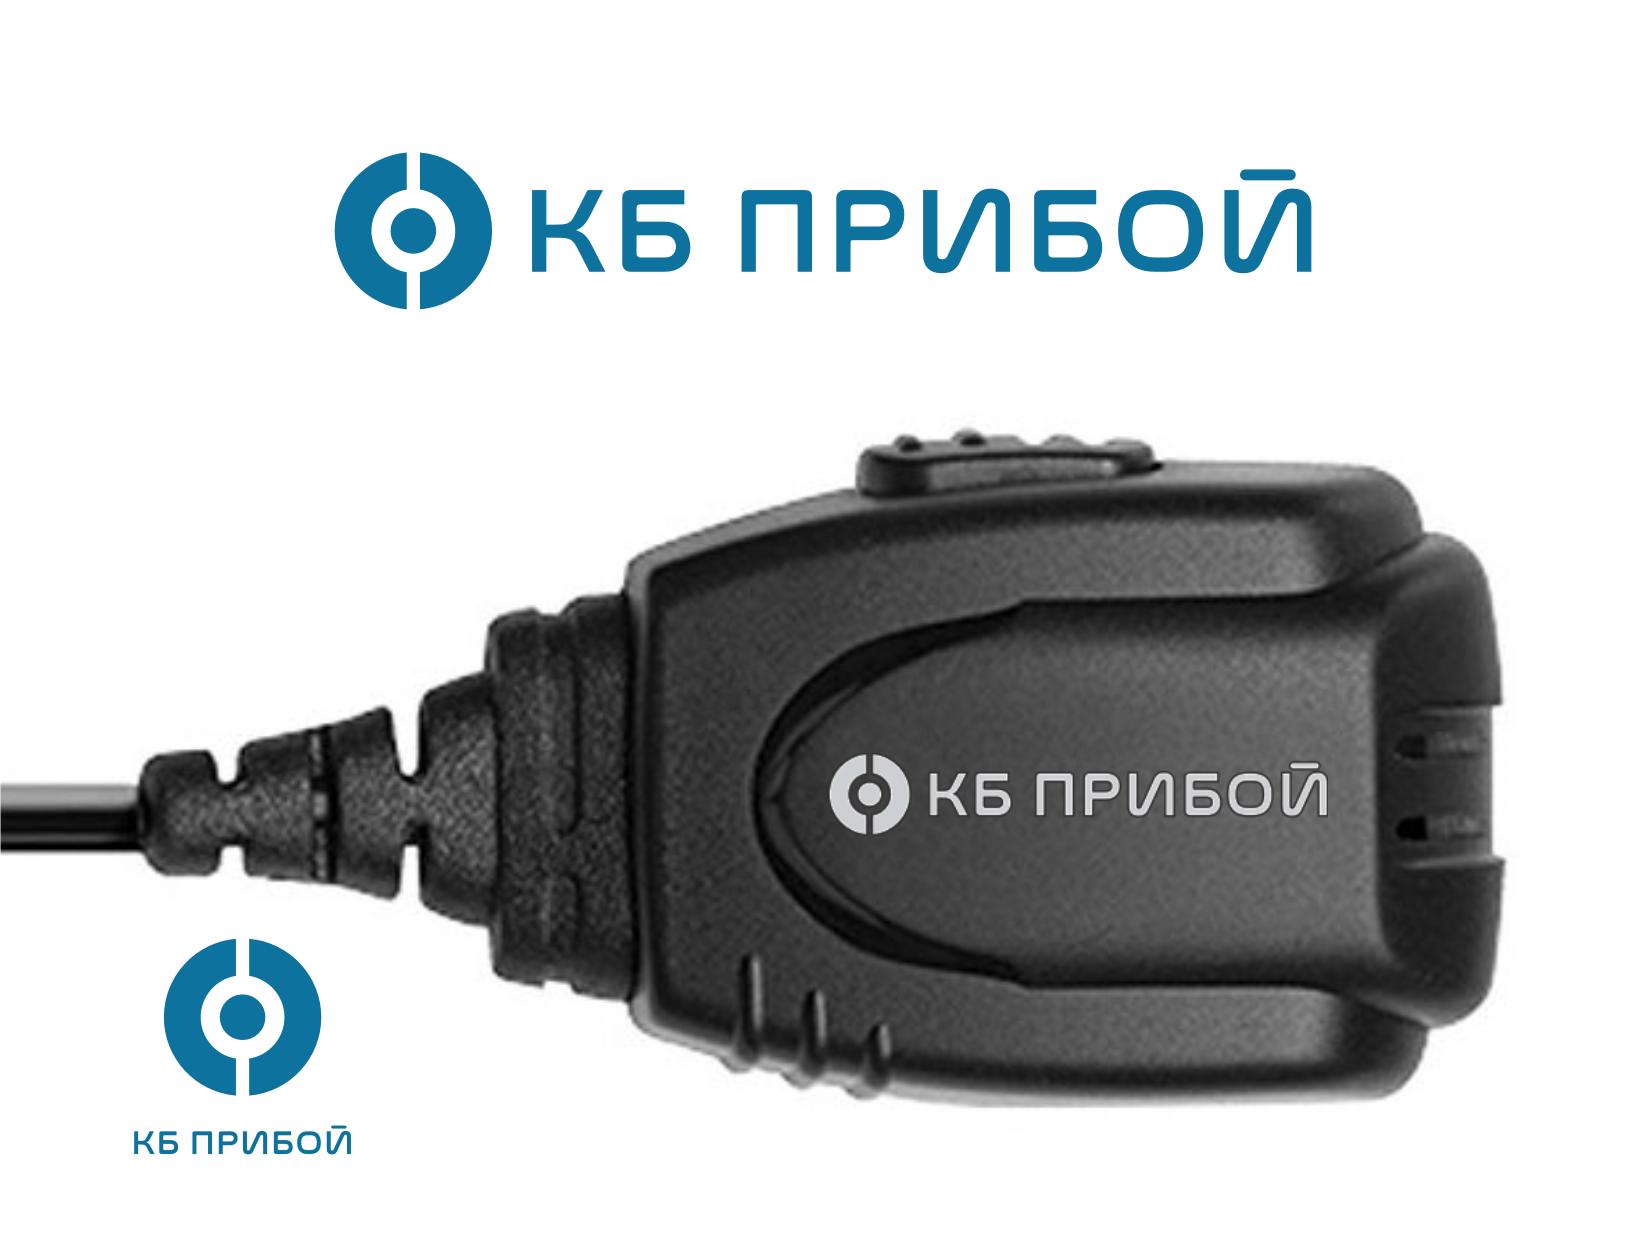 Разработка логотипа и фирменного стиля для КБ Прибой фото f_6995b24ac1ca8ee3.png